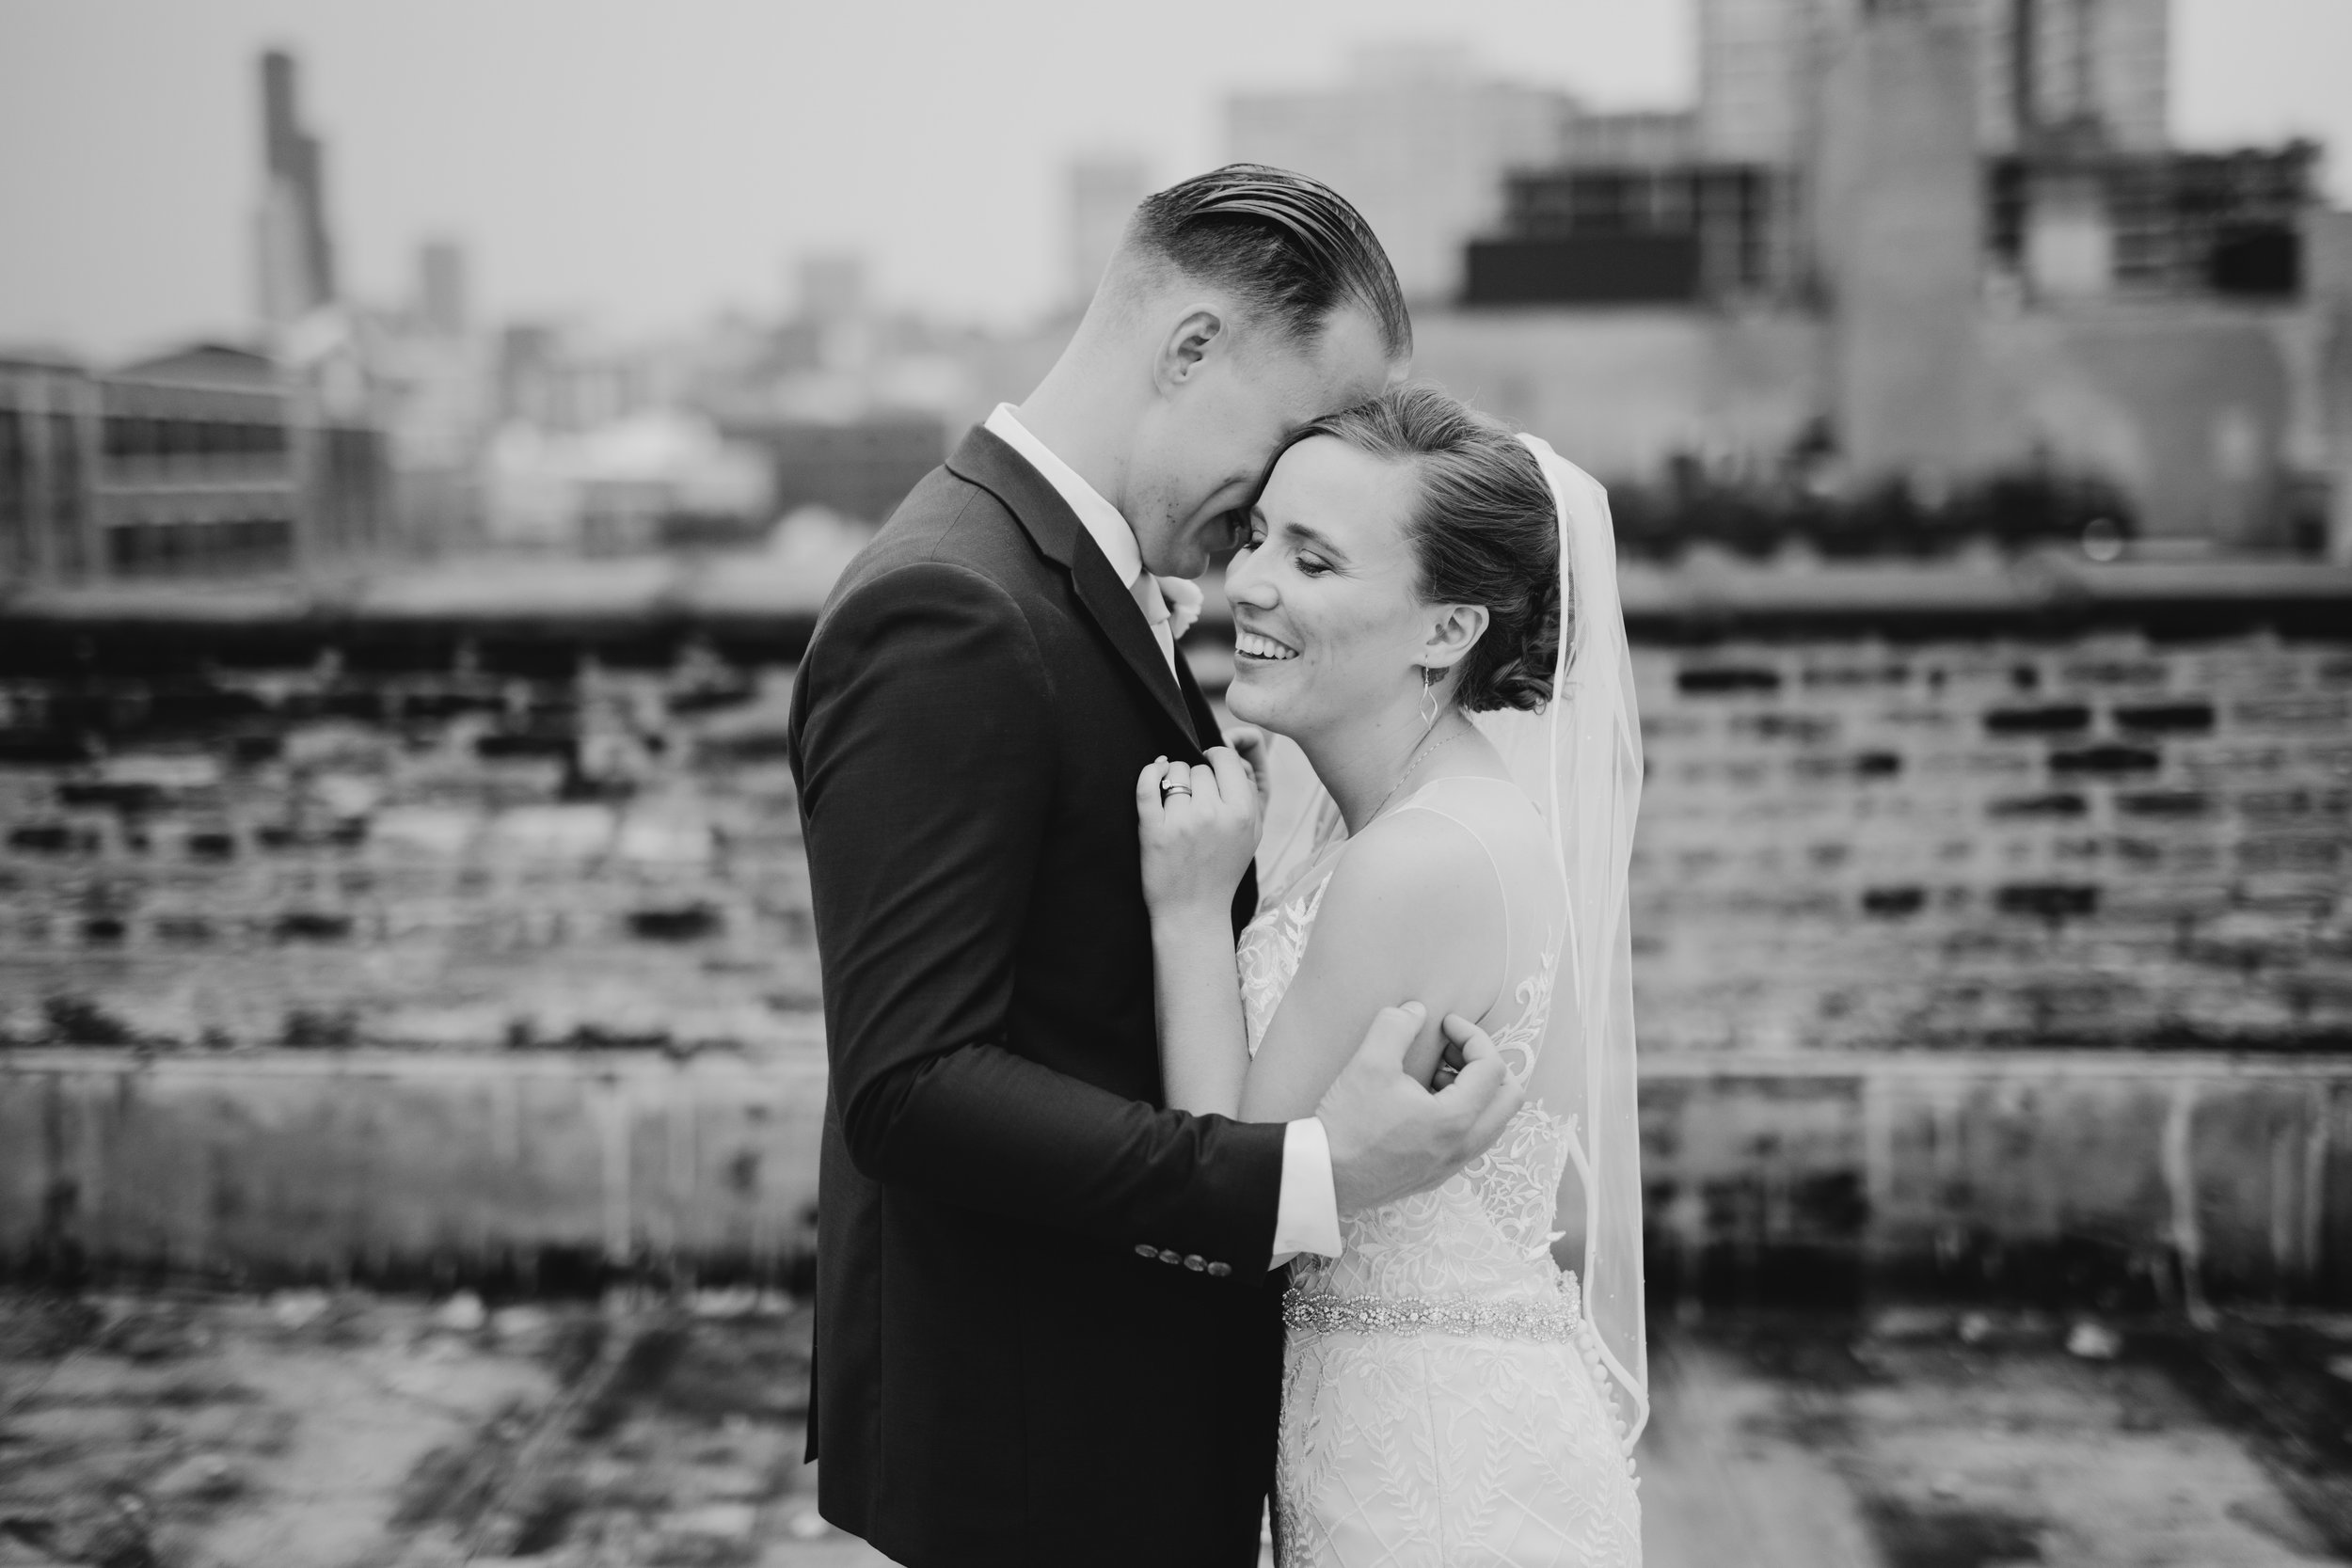 Vintage Wedding_Polly C Photography_20171726183534.jpg